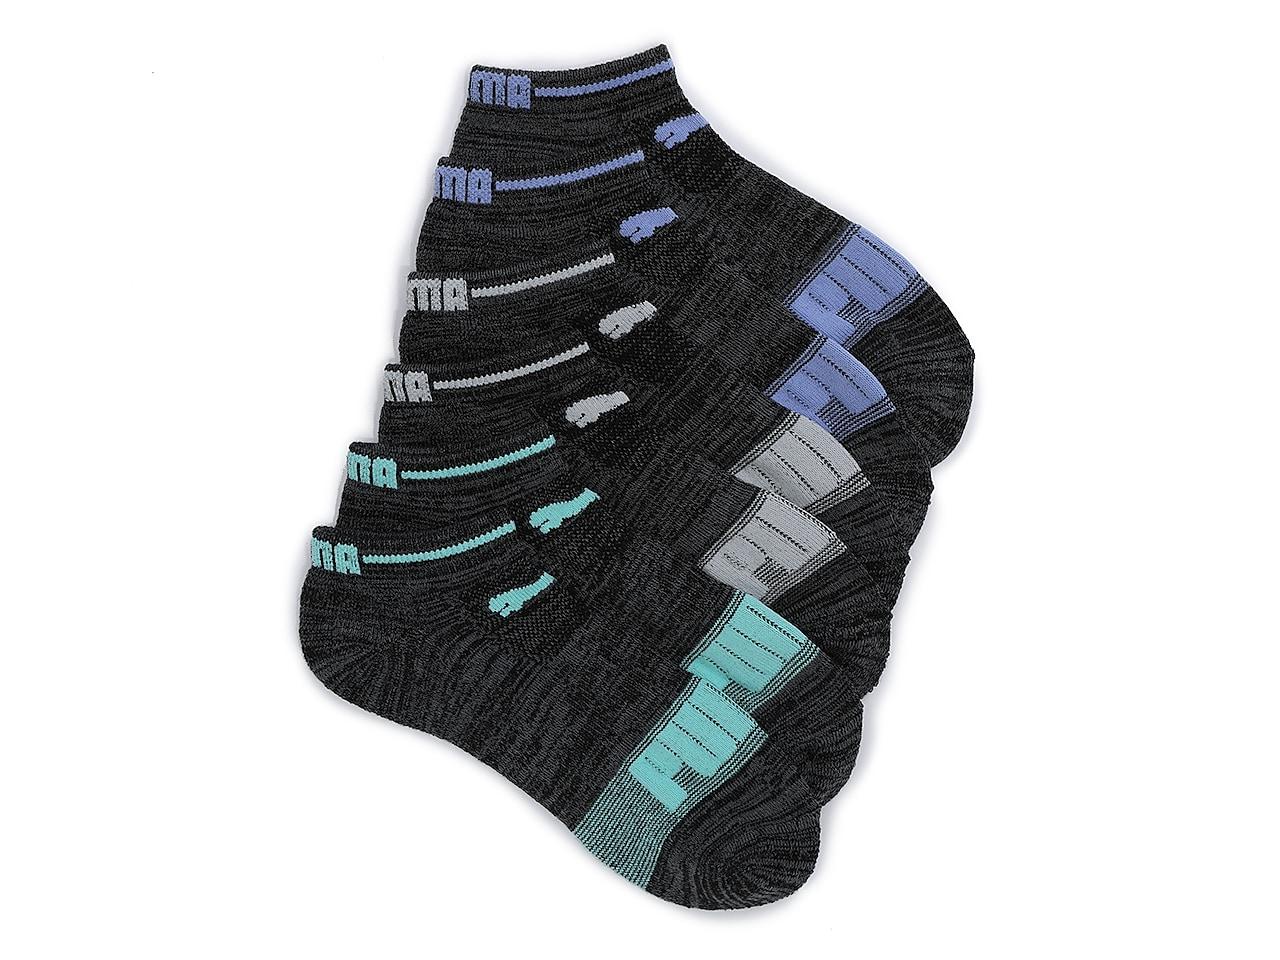 Terry Women's No Show Socks - 6 Pack